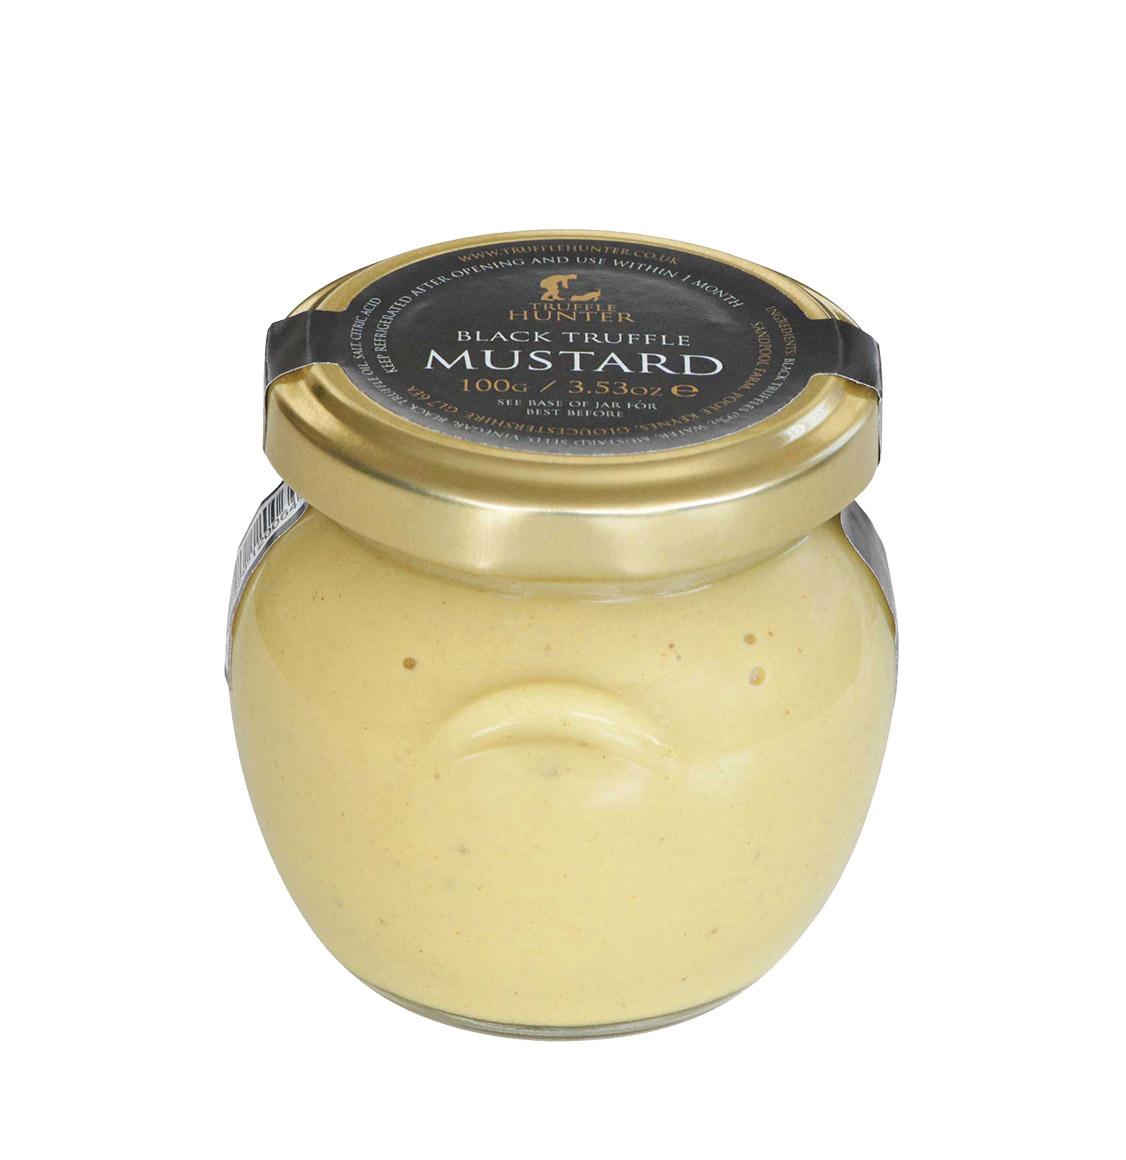 TruffleHunter Μουστάρδα Μαύρης Τρούφας Black Truffle Mustard 100g